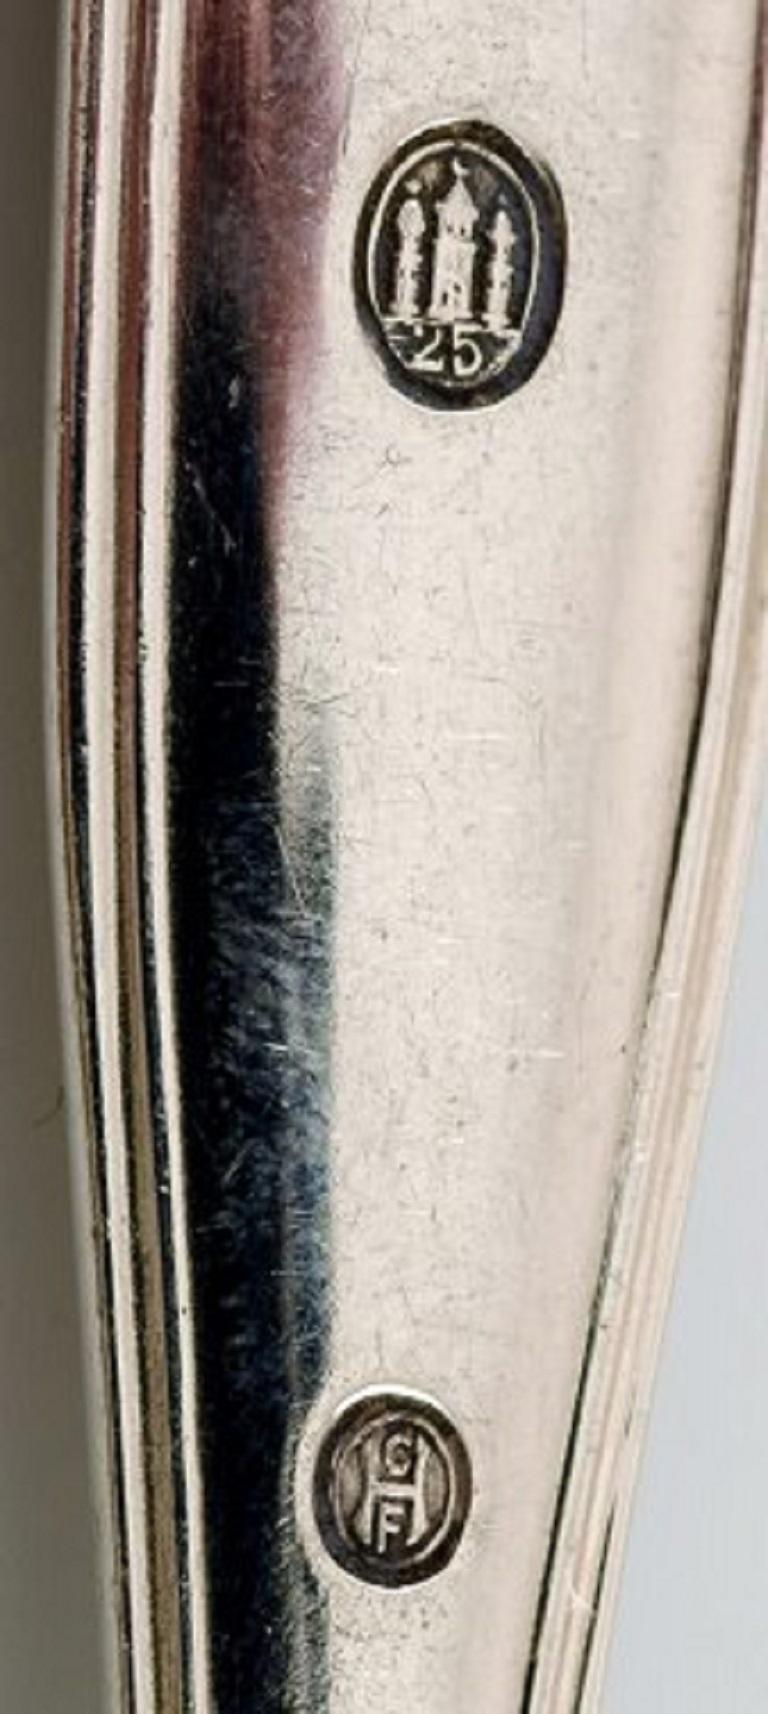 Danish Silversmith, Old Danish Fork in Silver, 1920s-1930s, 4 Pieces In Good Condition For Sale In Copenhagen, Denmark